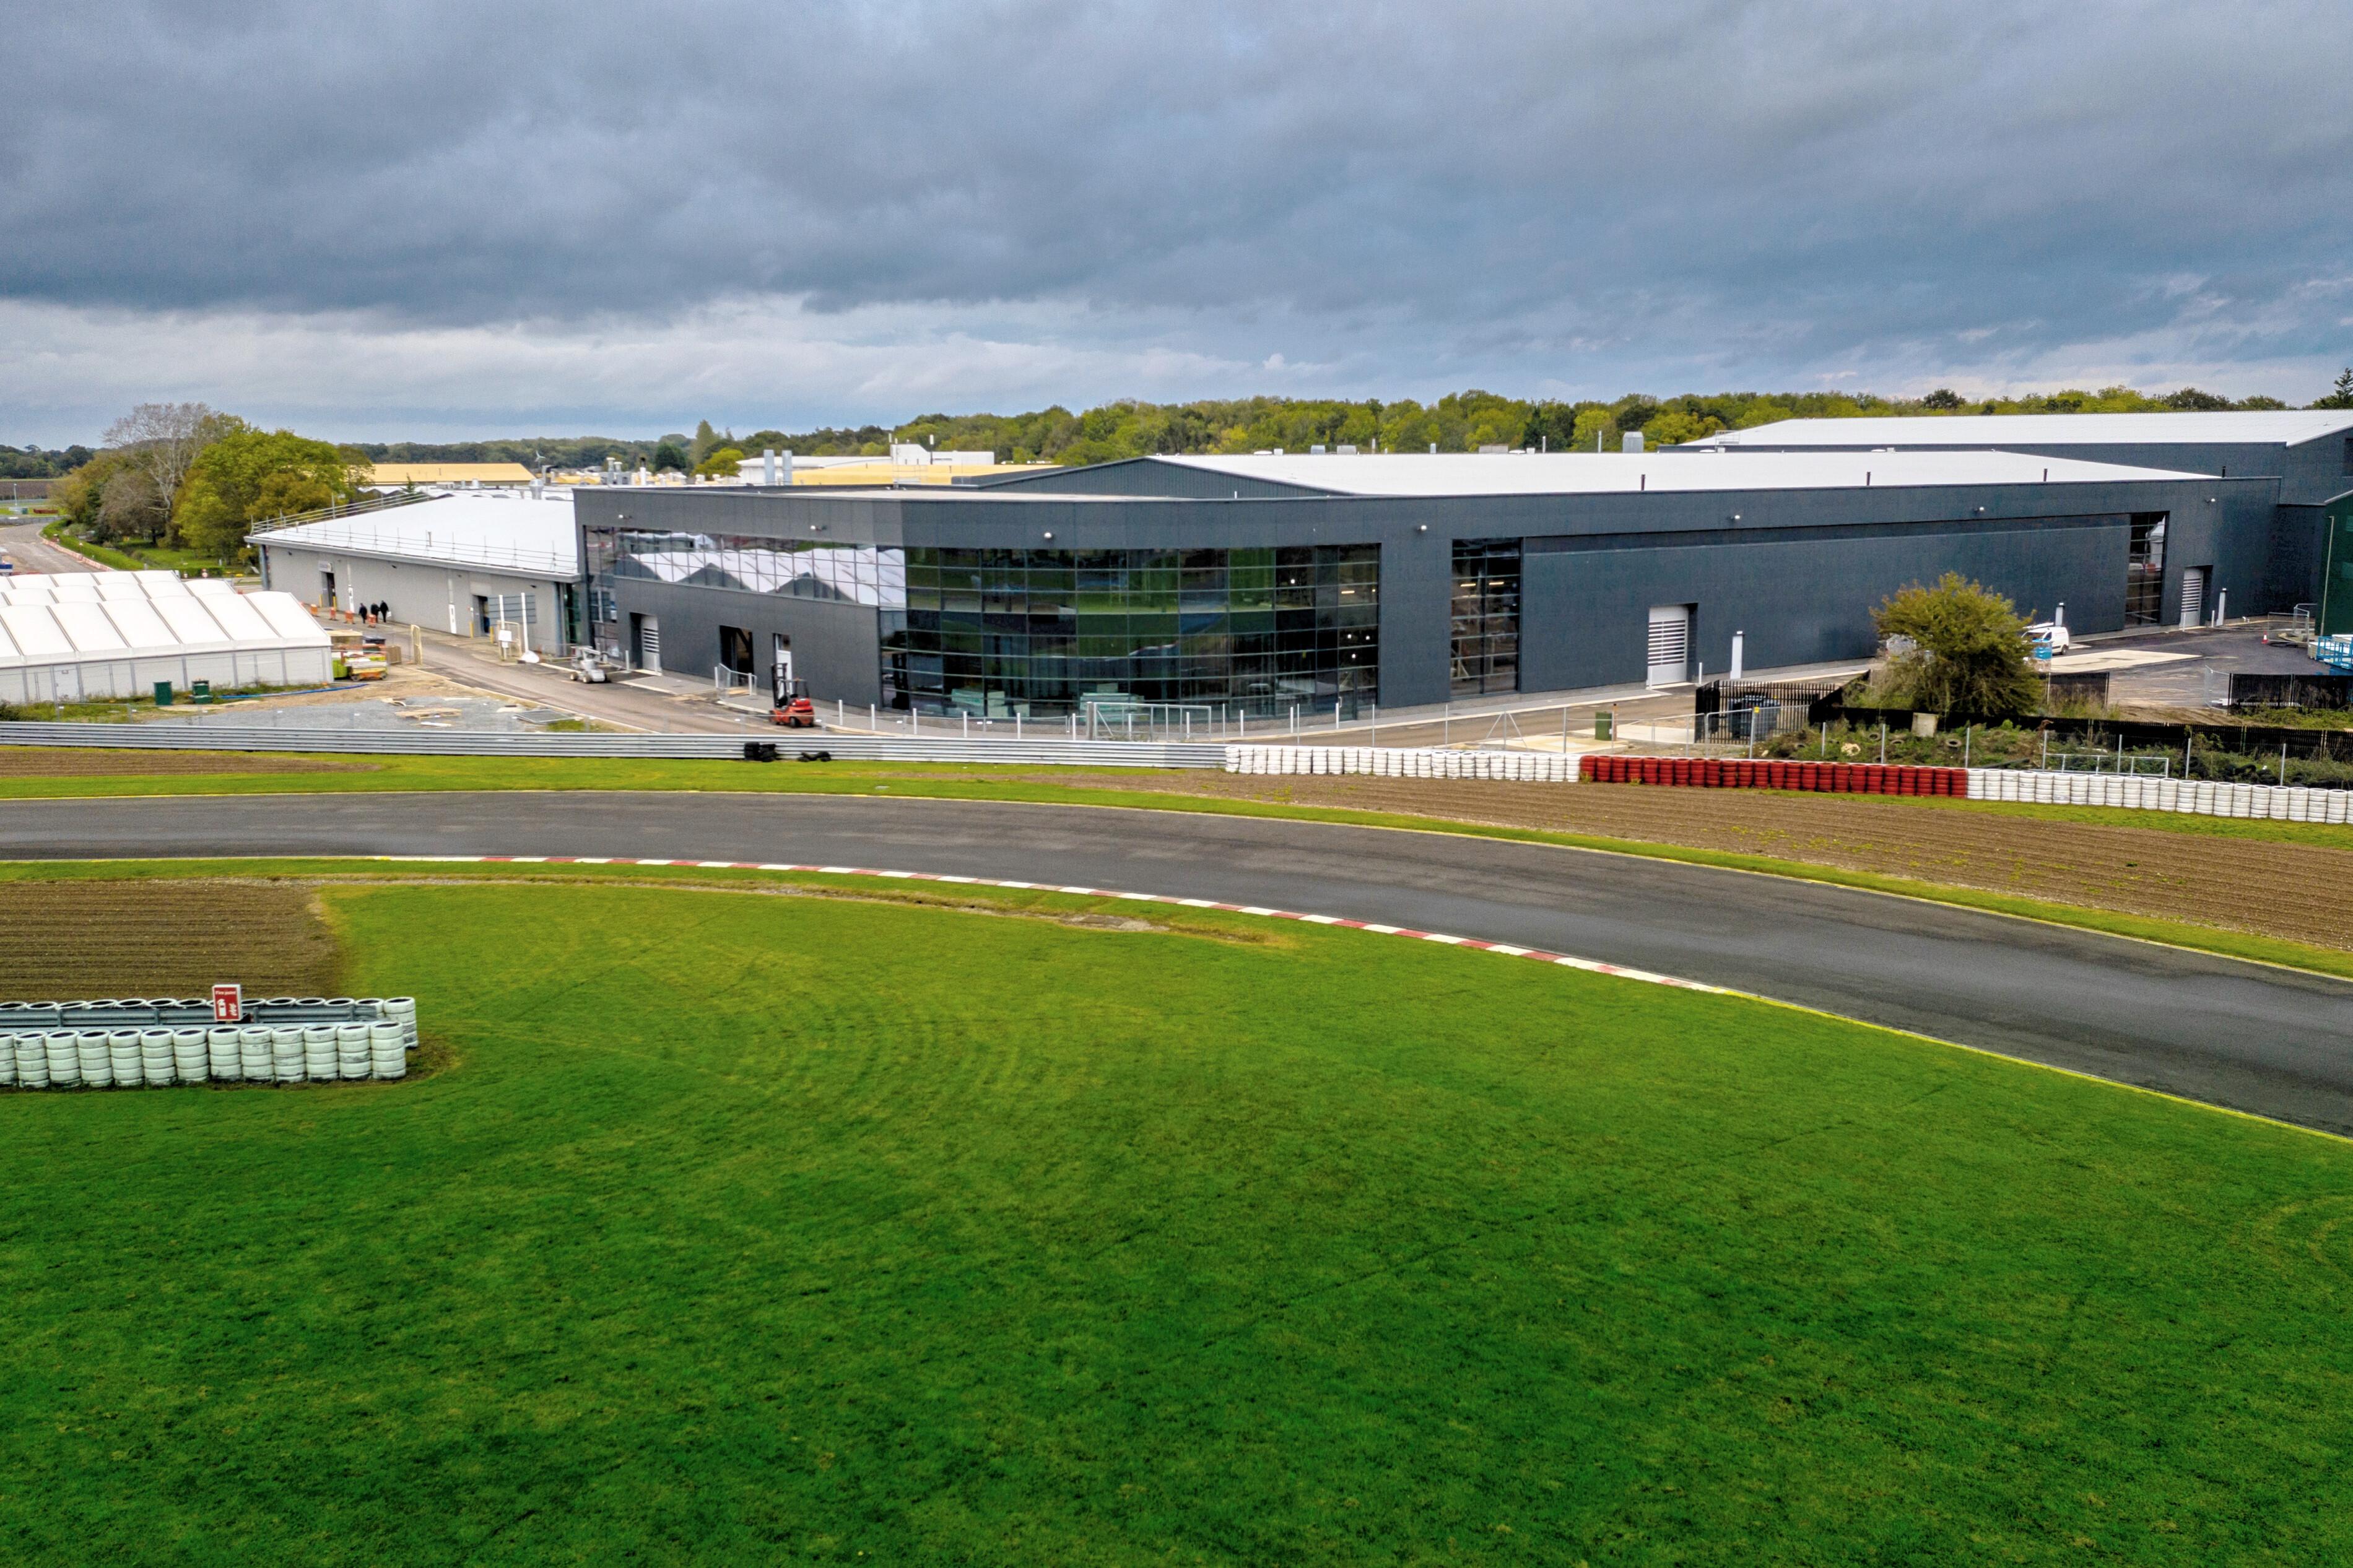 Motor Features New Hethel Sports Car Factory 2